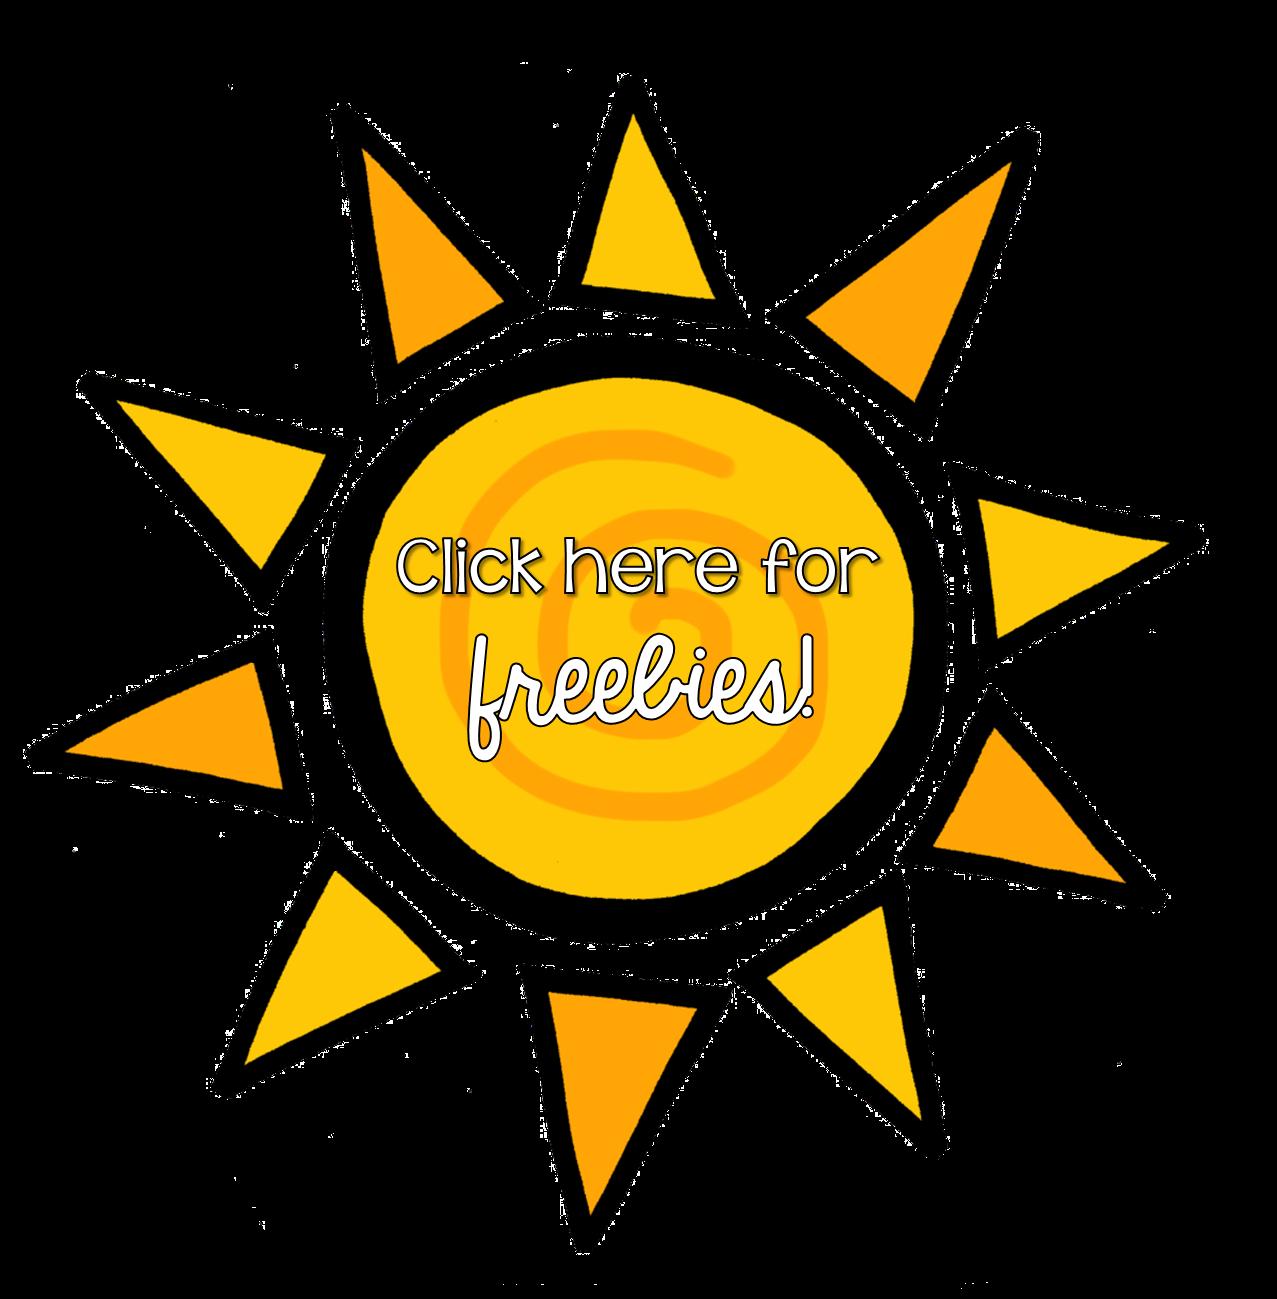 http://www.teacherspayteachers.com/Product/Ready-Set-Print-Summer-Freebie-Printables-1276731